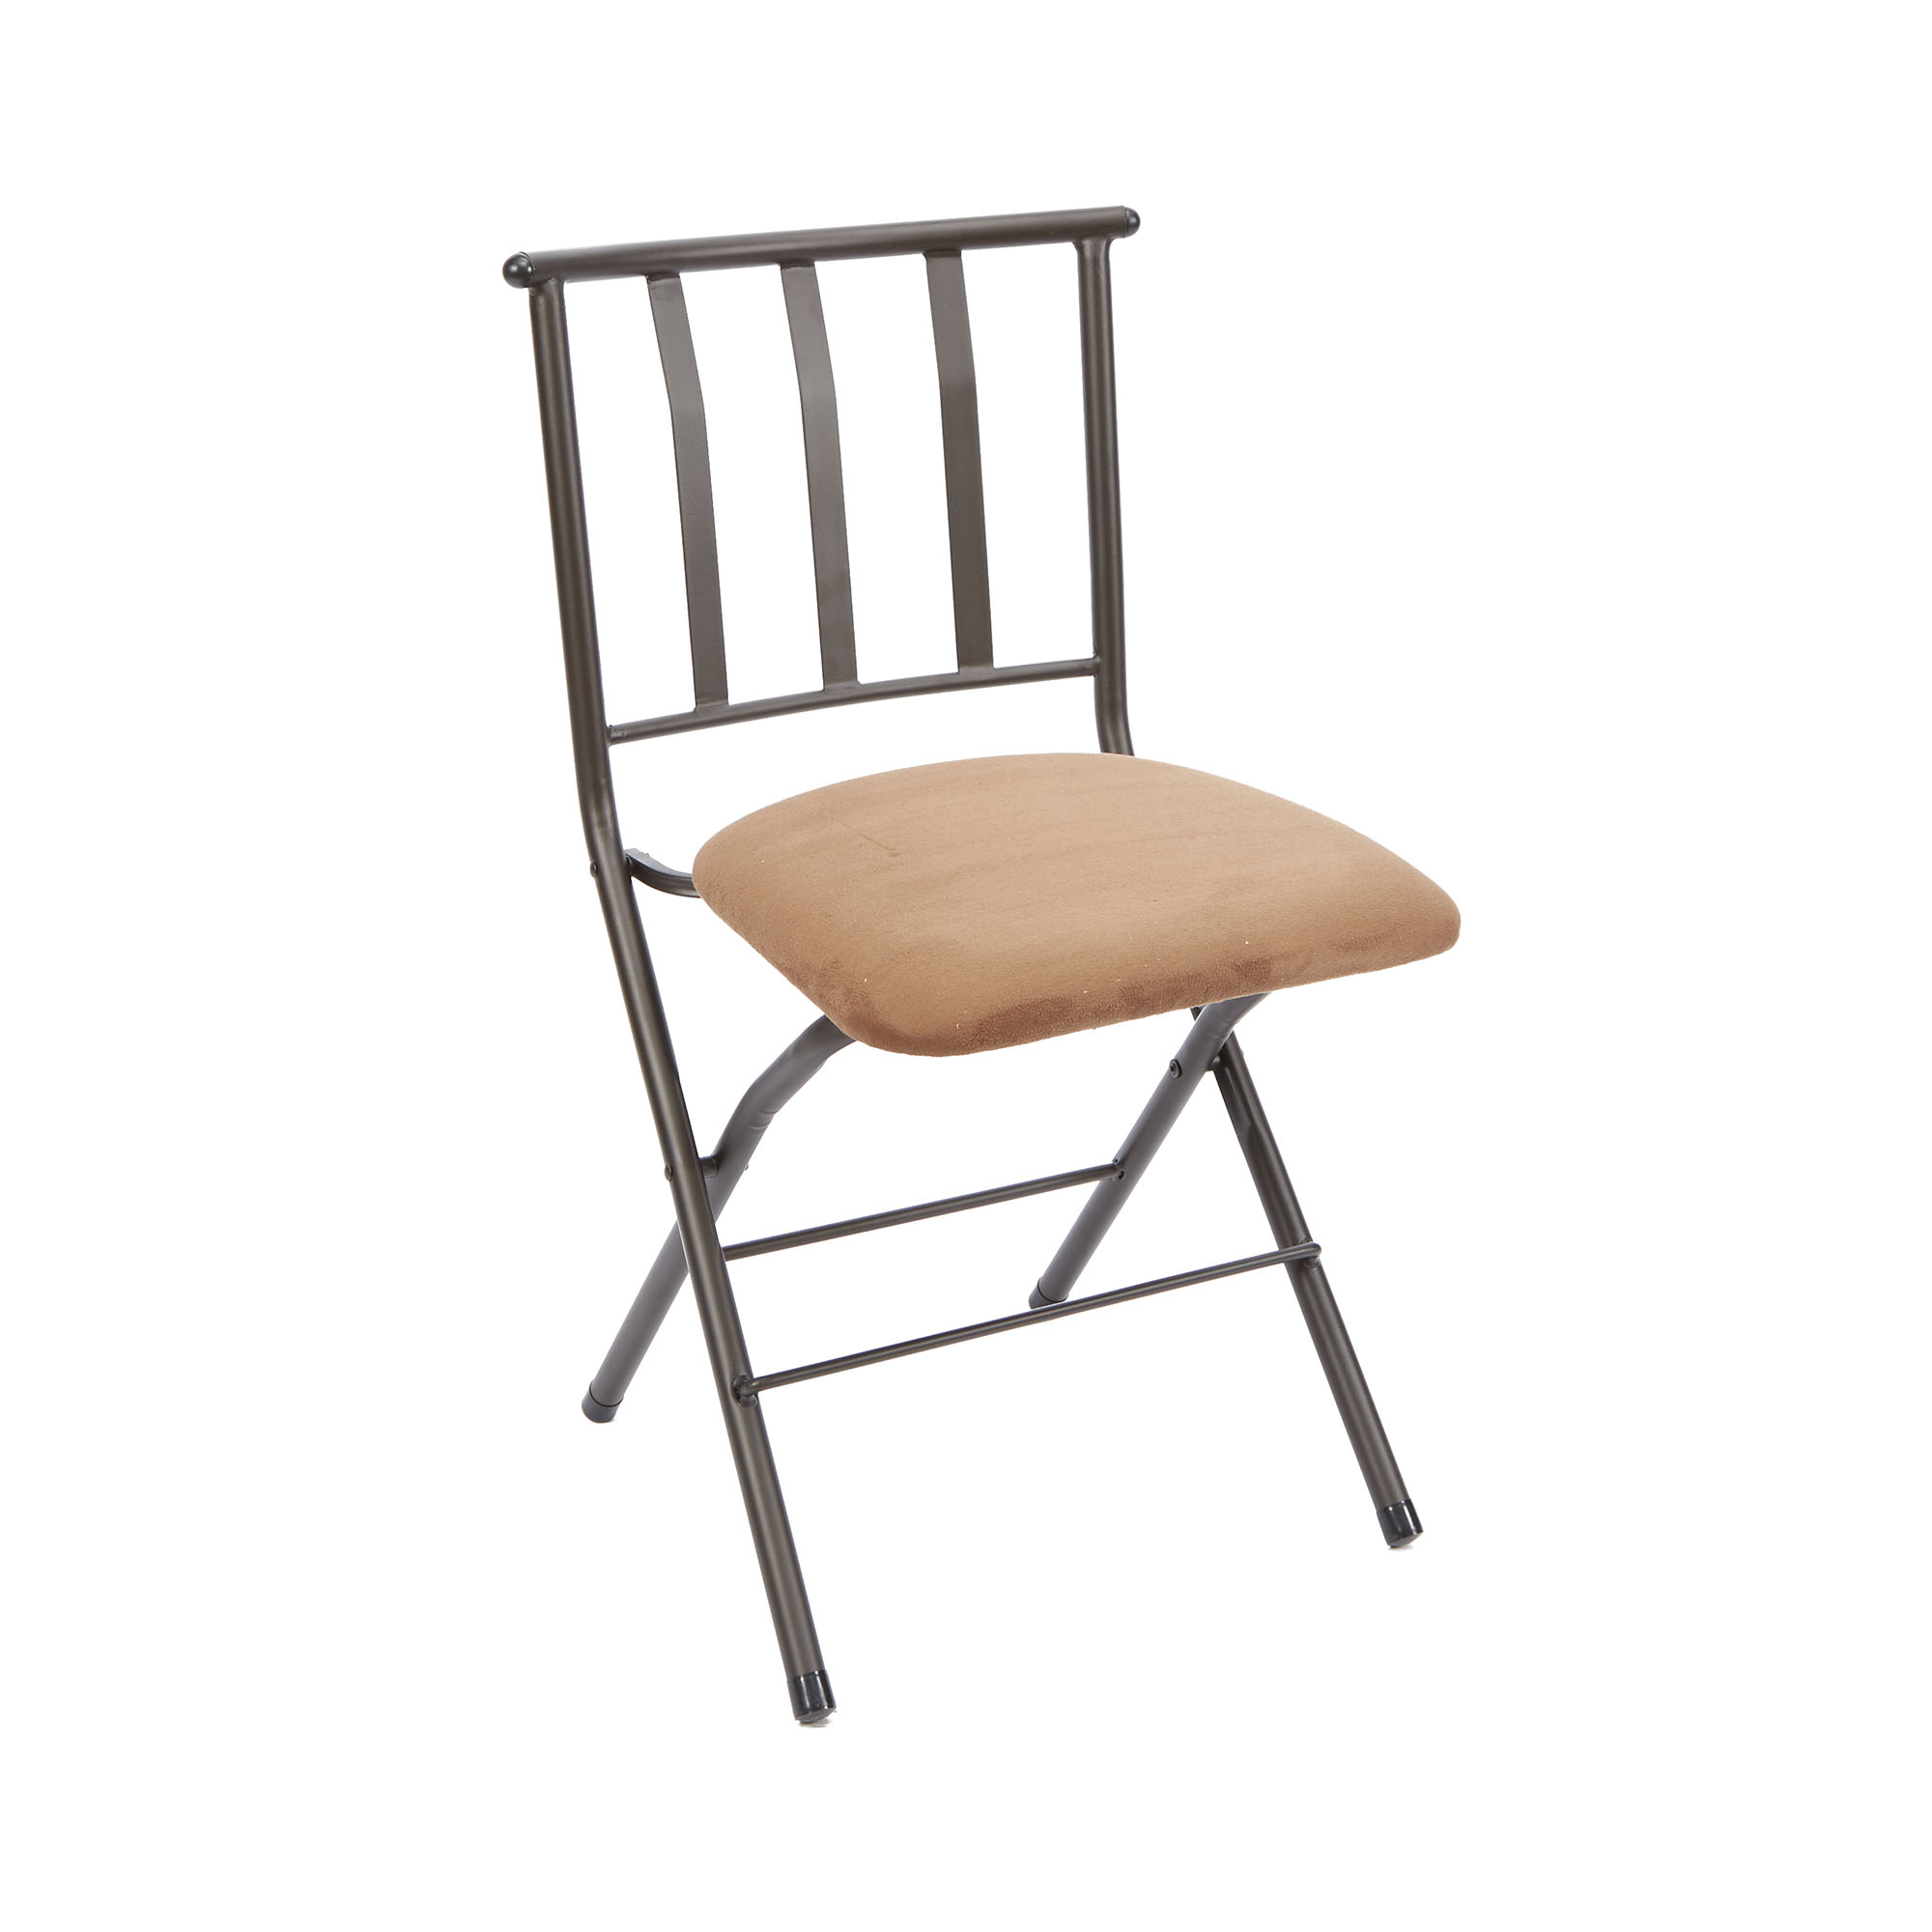 Slat Back Chairs mainstays slat-back folding dining chair, tan - walmart